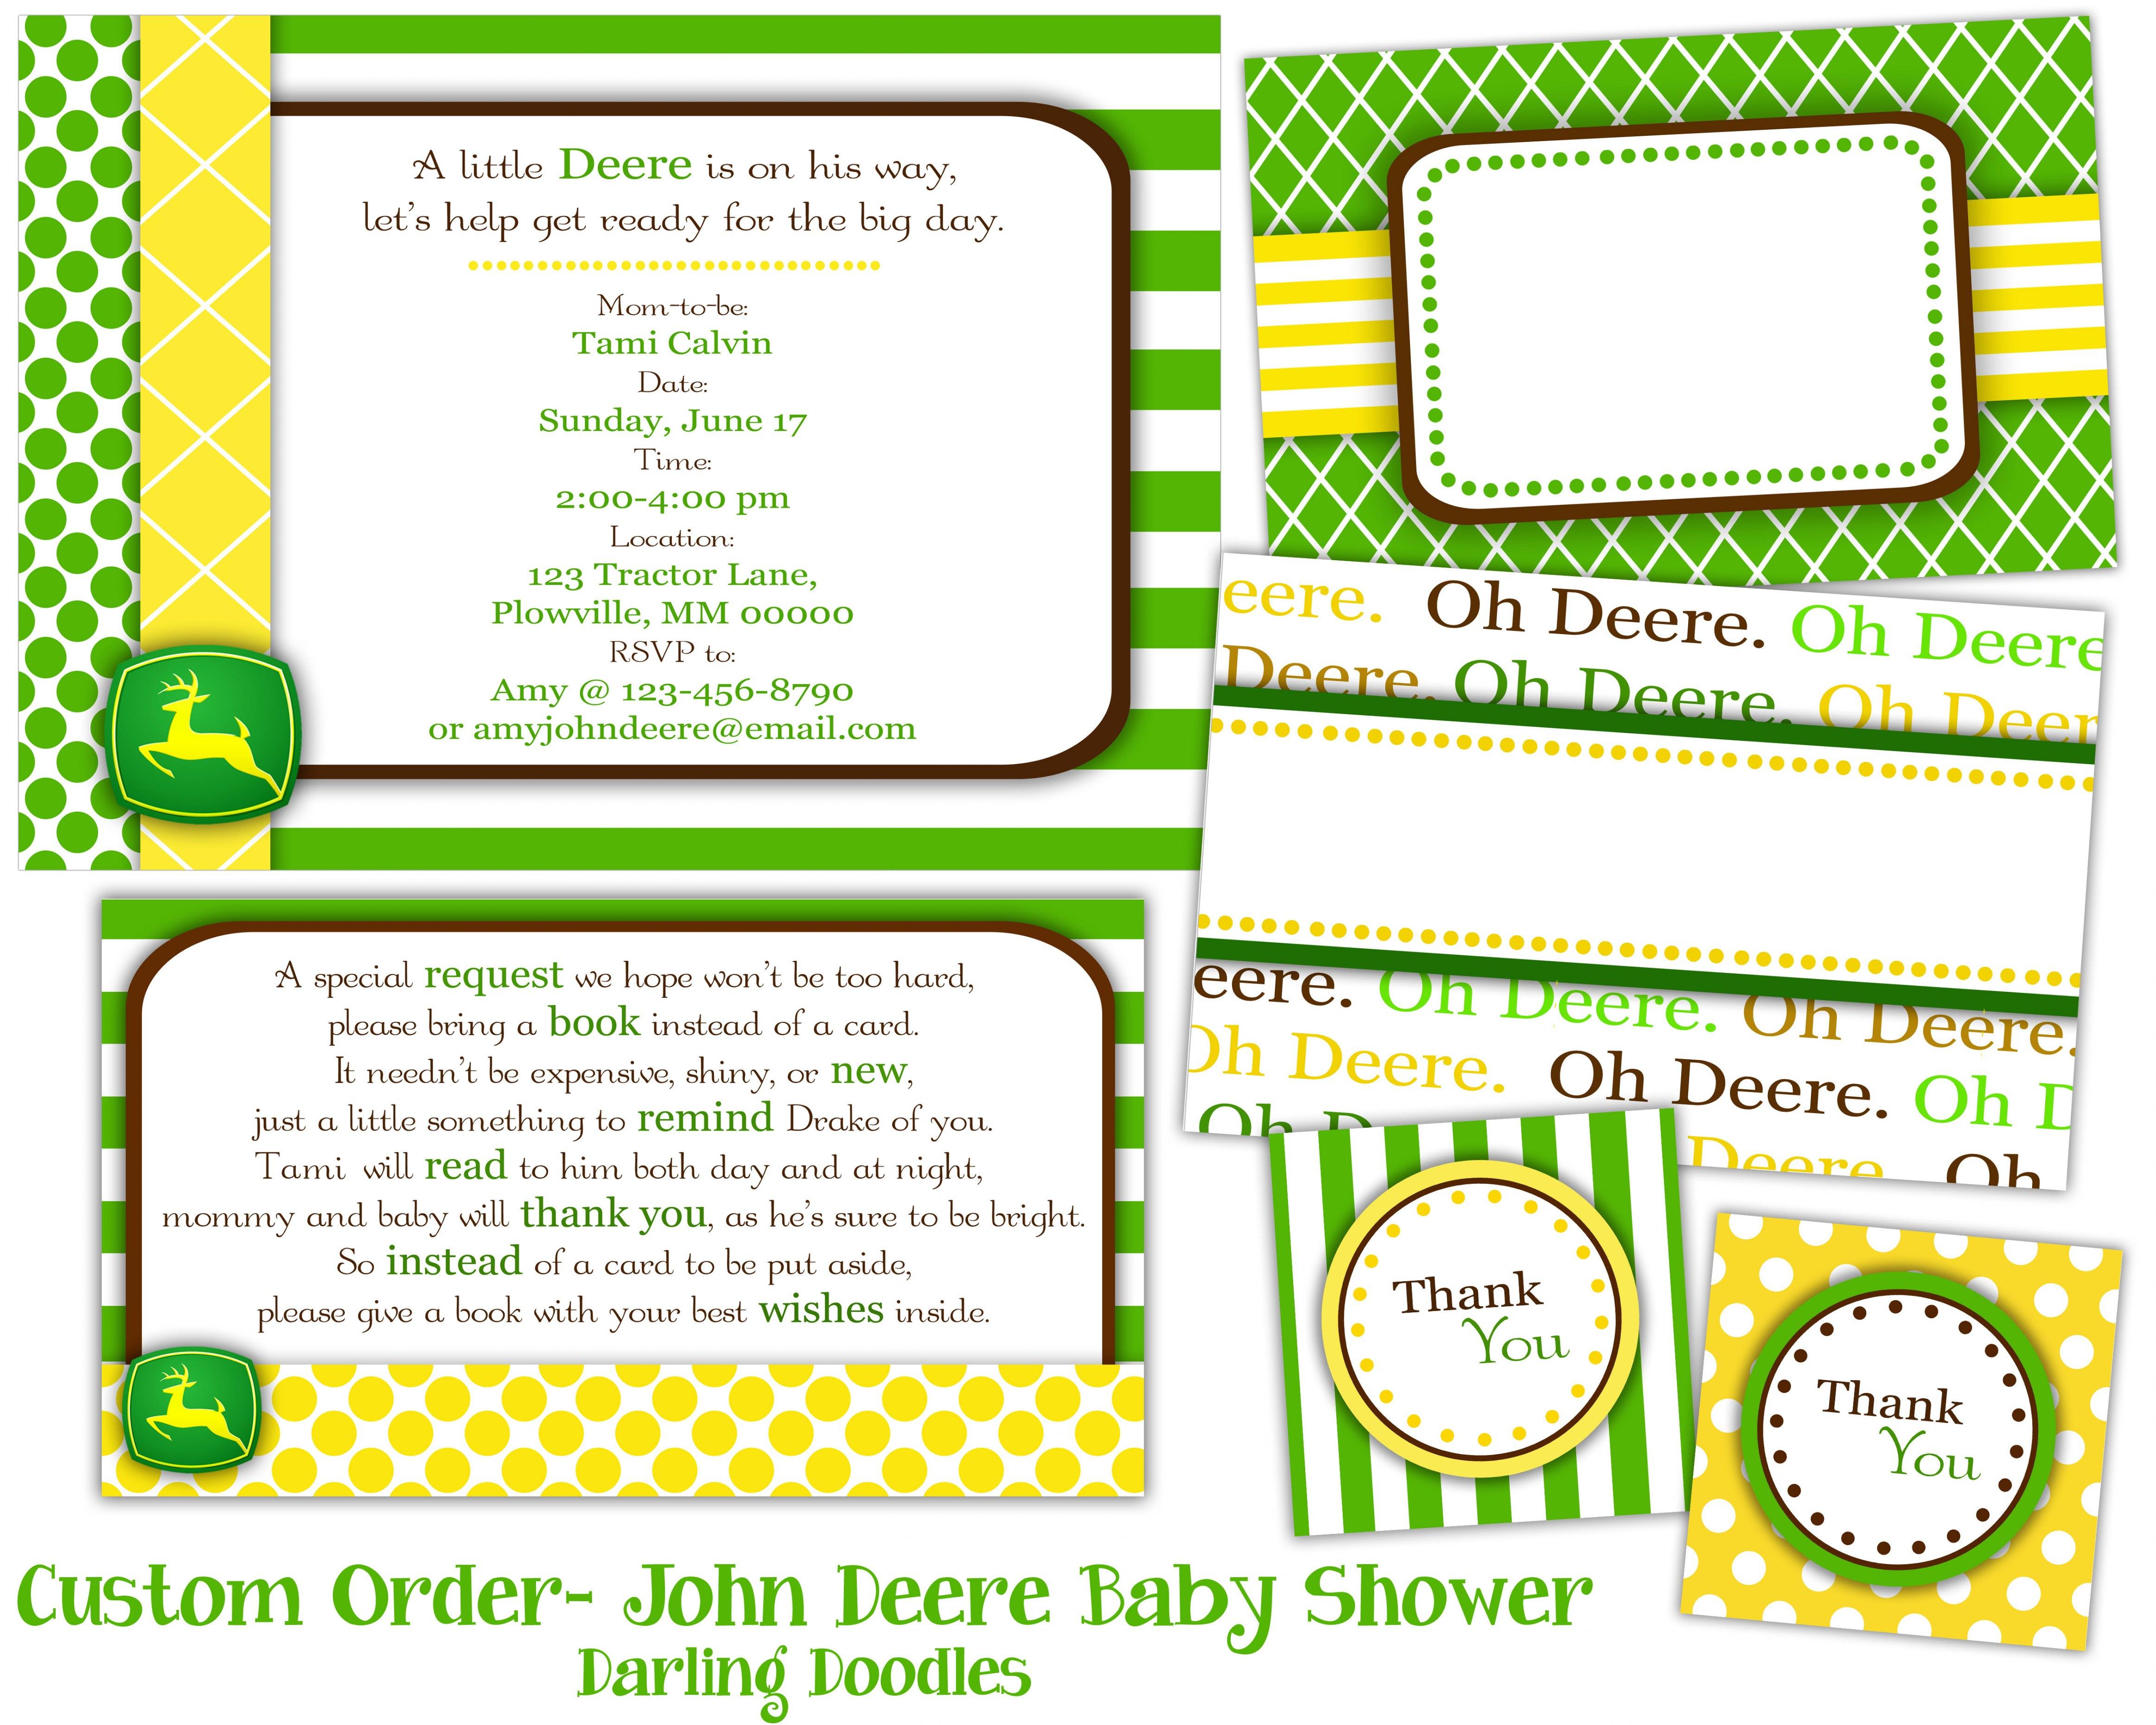 John Deere Baby Shower Ideas John Deere Baby Showerjohn Deere Gift - Free Printable John Deere Baby Shower Invitations